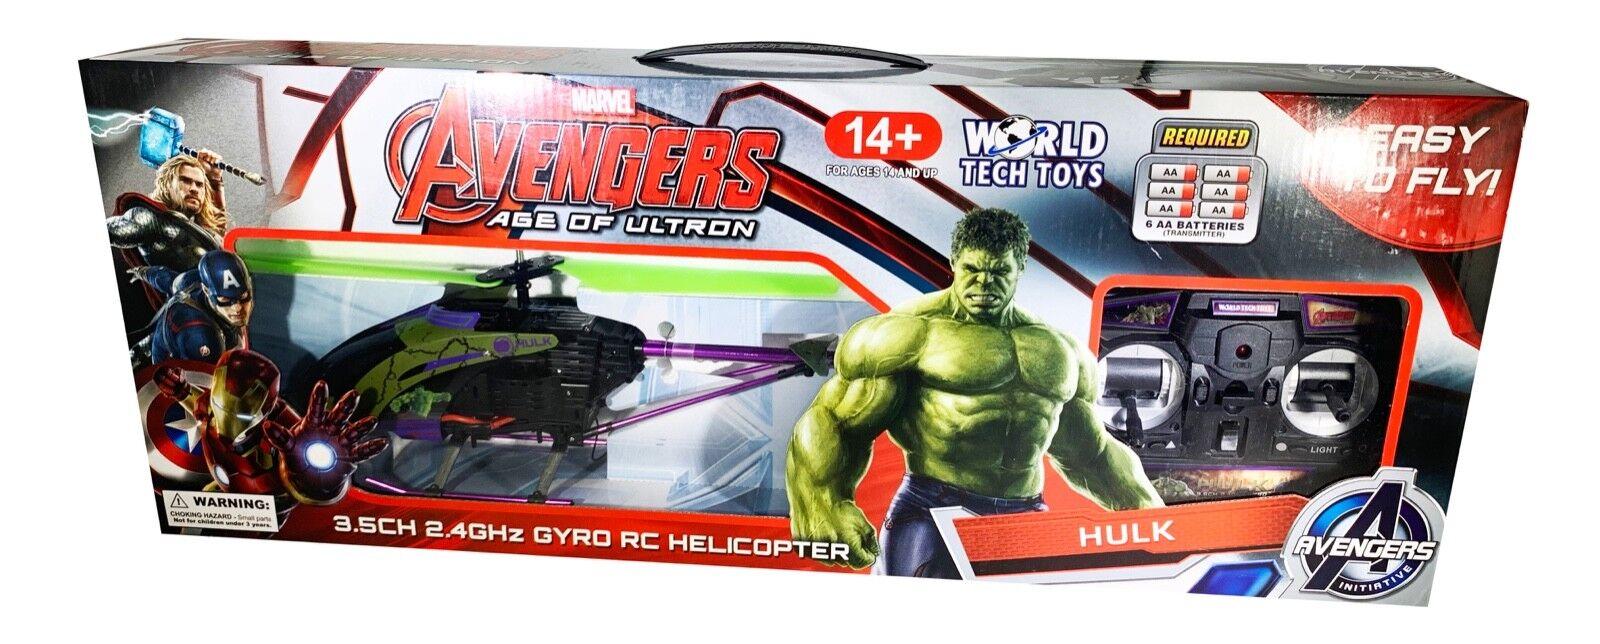 Welt - spielzeug marvel avengers alter ultron hulk rc helikopter